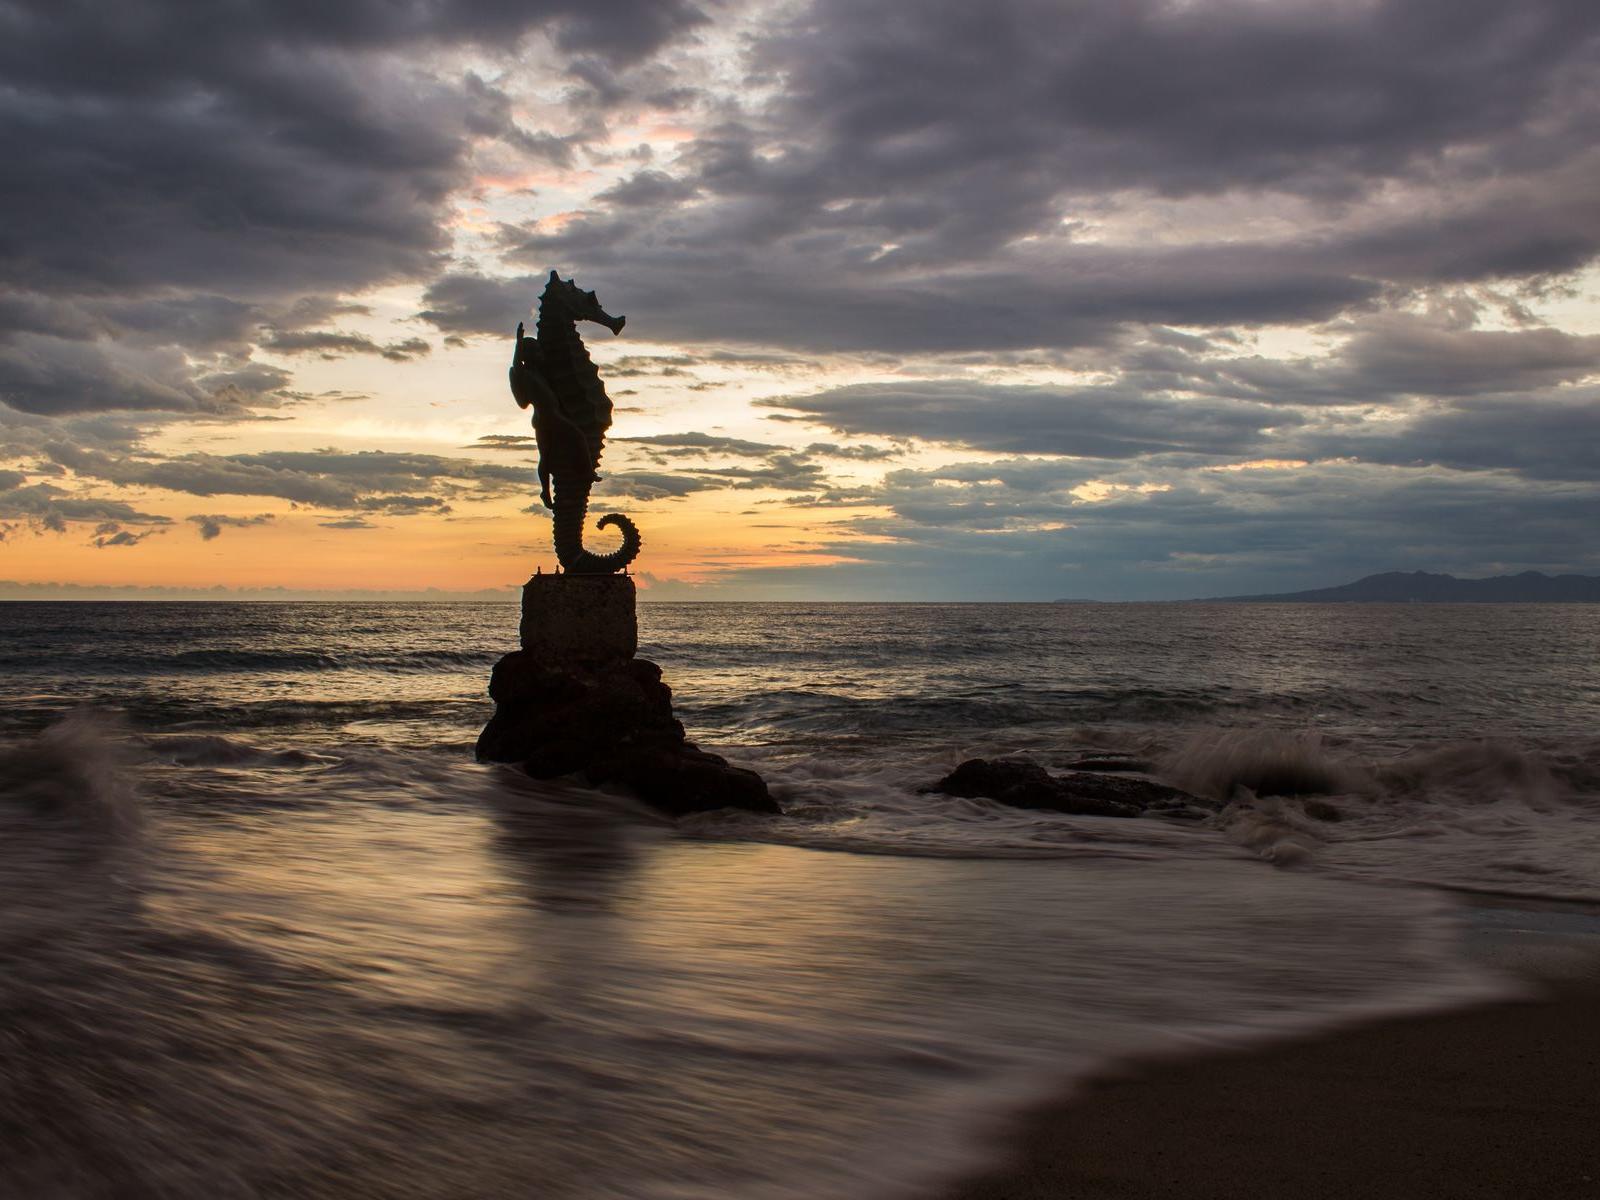 a sea horse statue